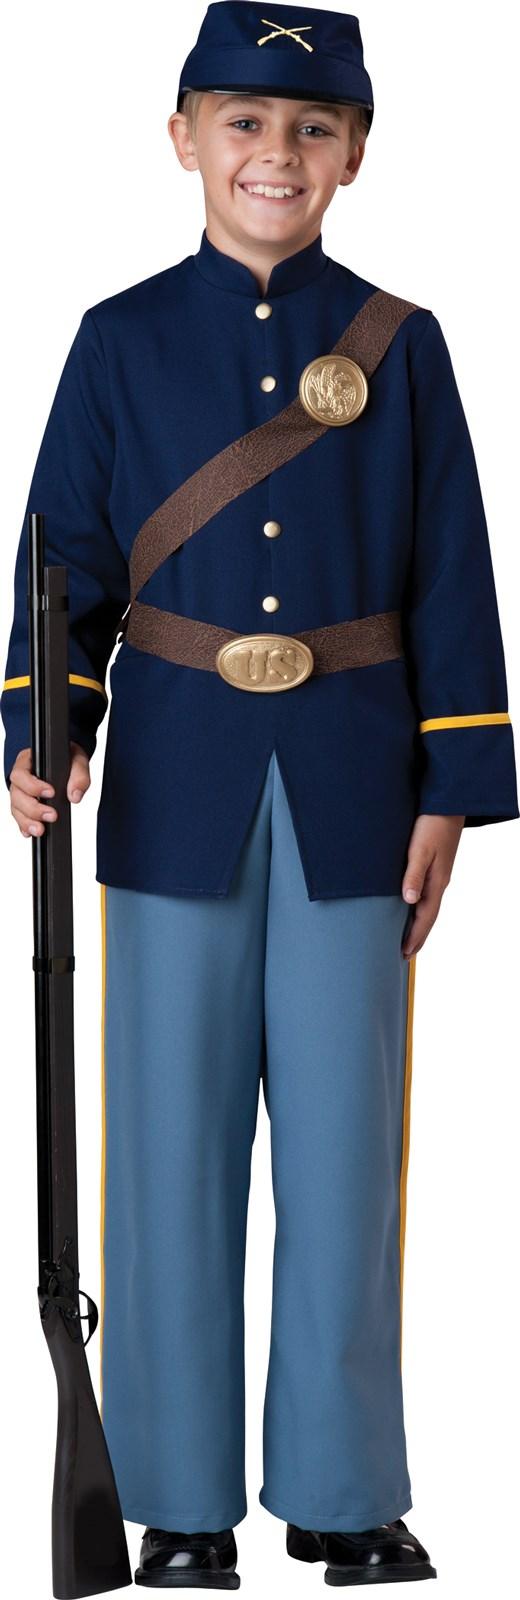 Image of Civil War Soldier Child Costume